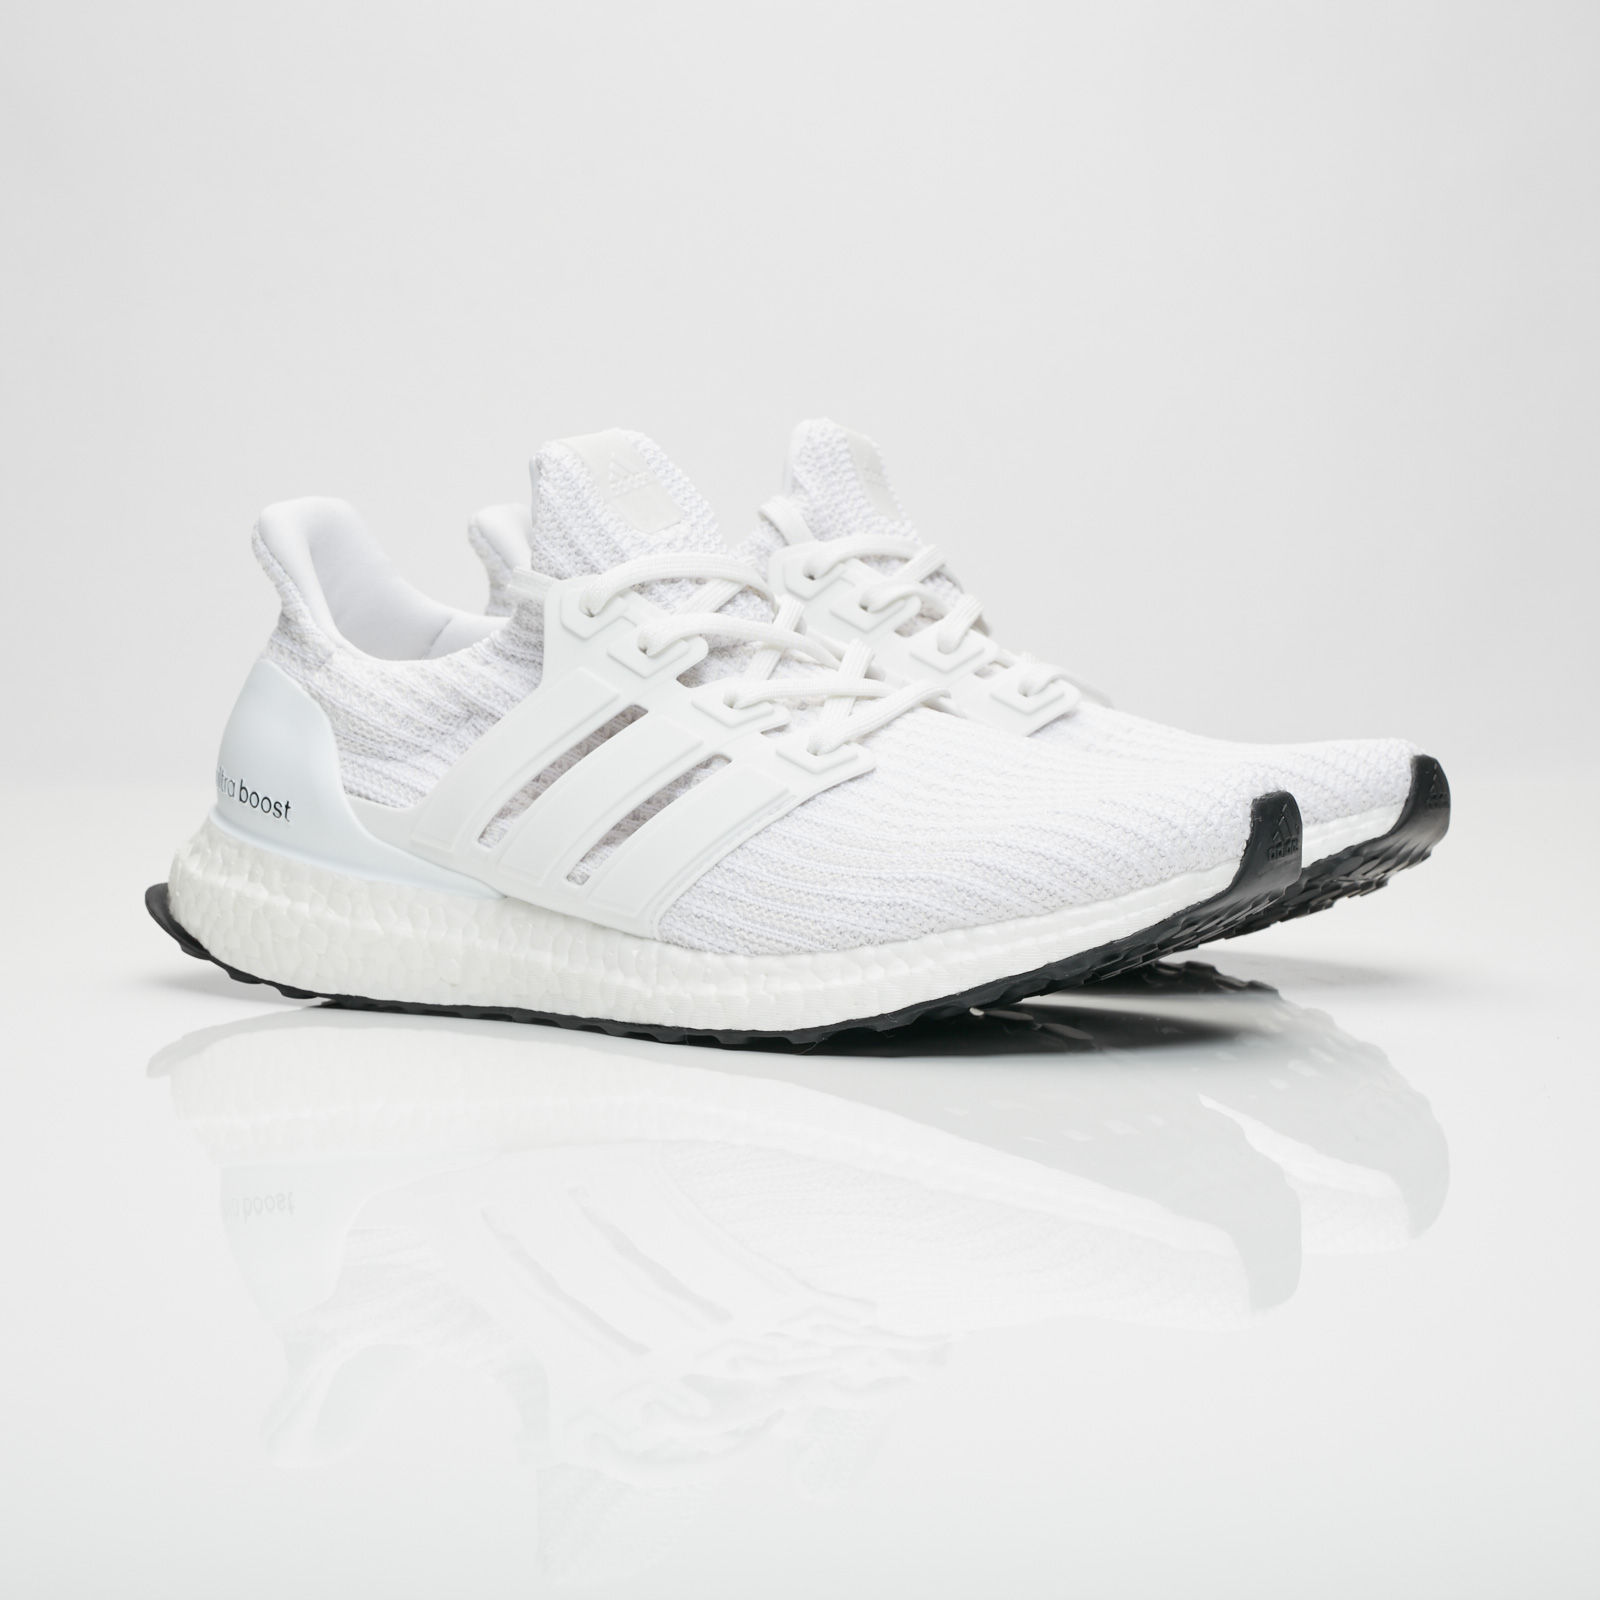 new concept 9ceb8 5b7d1 adidas UltraBOOST - Bb6168 - Sneakersnstuff | sneakers ...